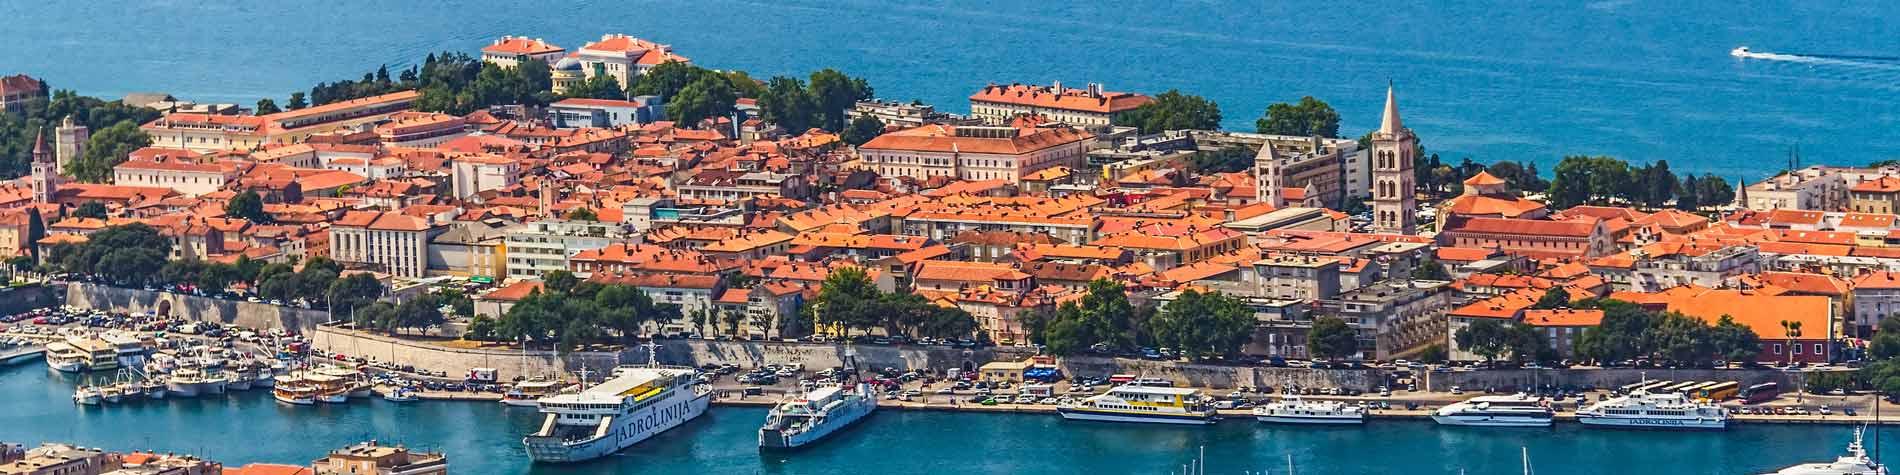 Cheap Flights To Zadar Ryanair Com